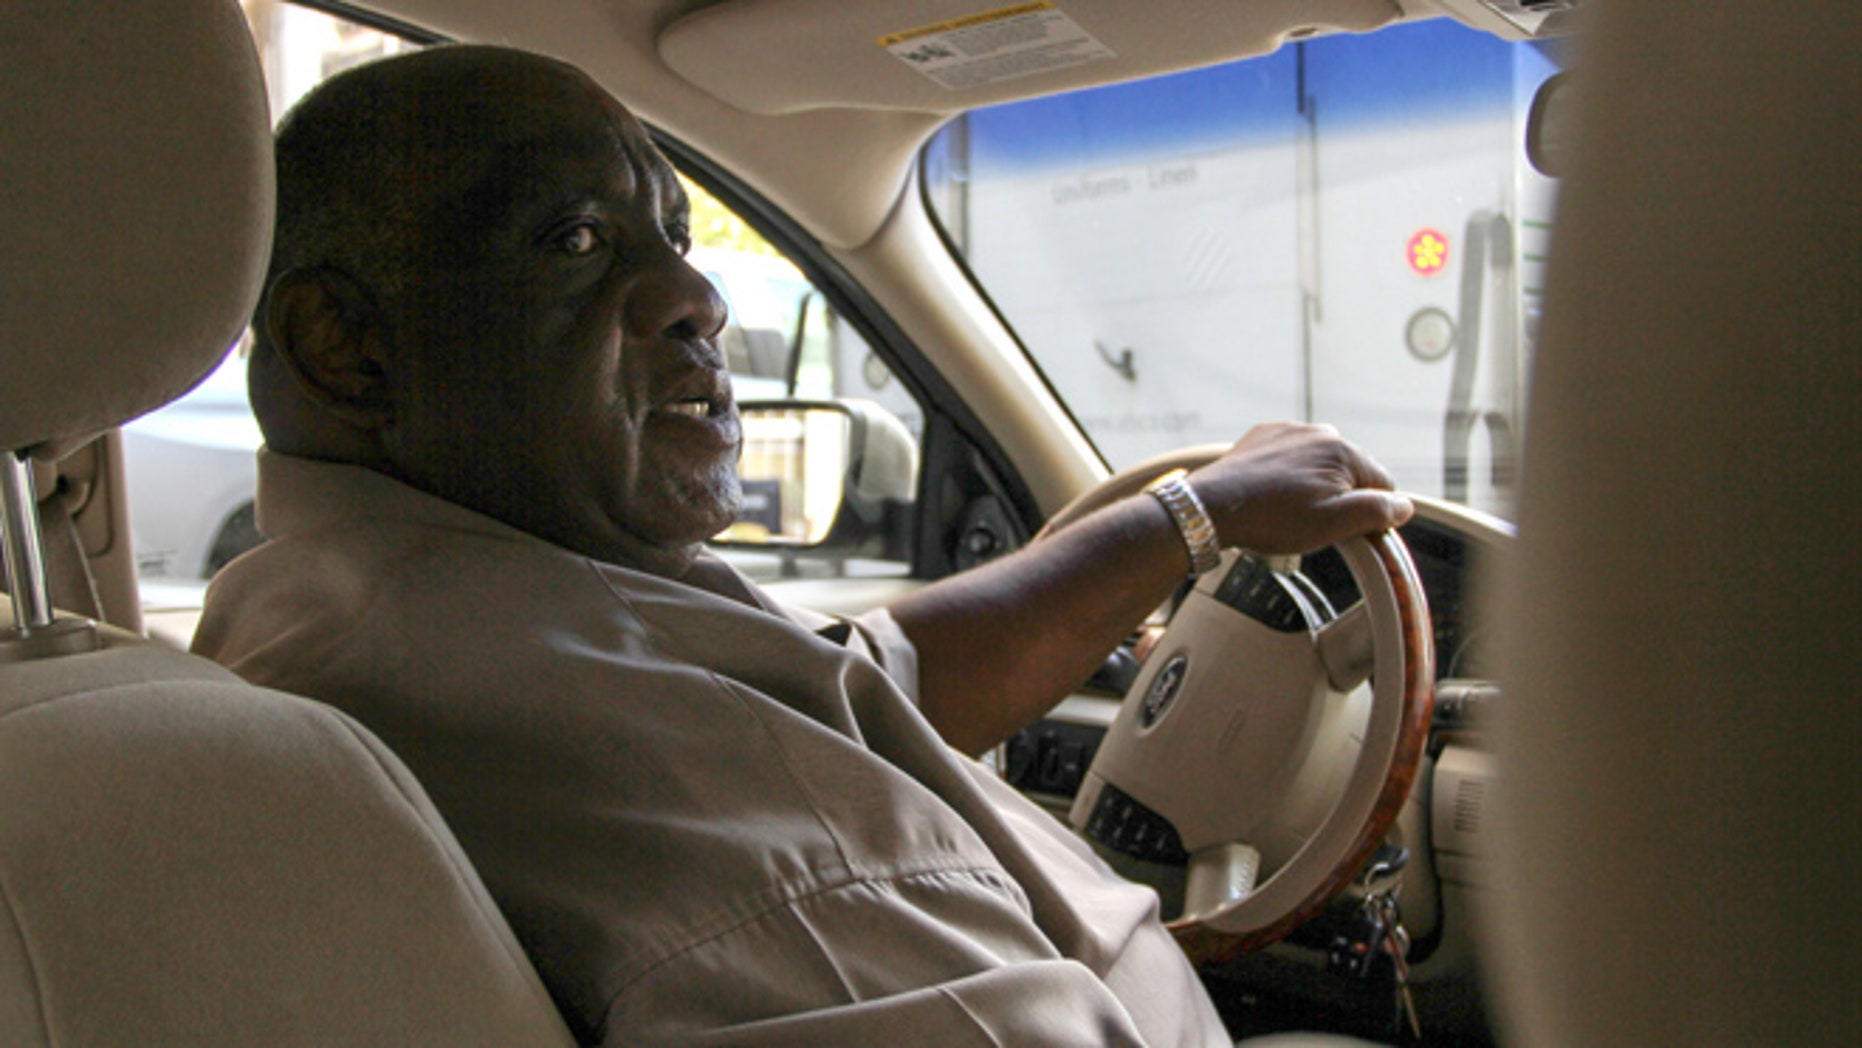 Retired bus driver Ellis Hill drives the car he uses as an Uber driver Thursday, Aug. 11, 2016, in Philadelphia. (AP Photo/Dake Kang)